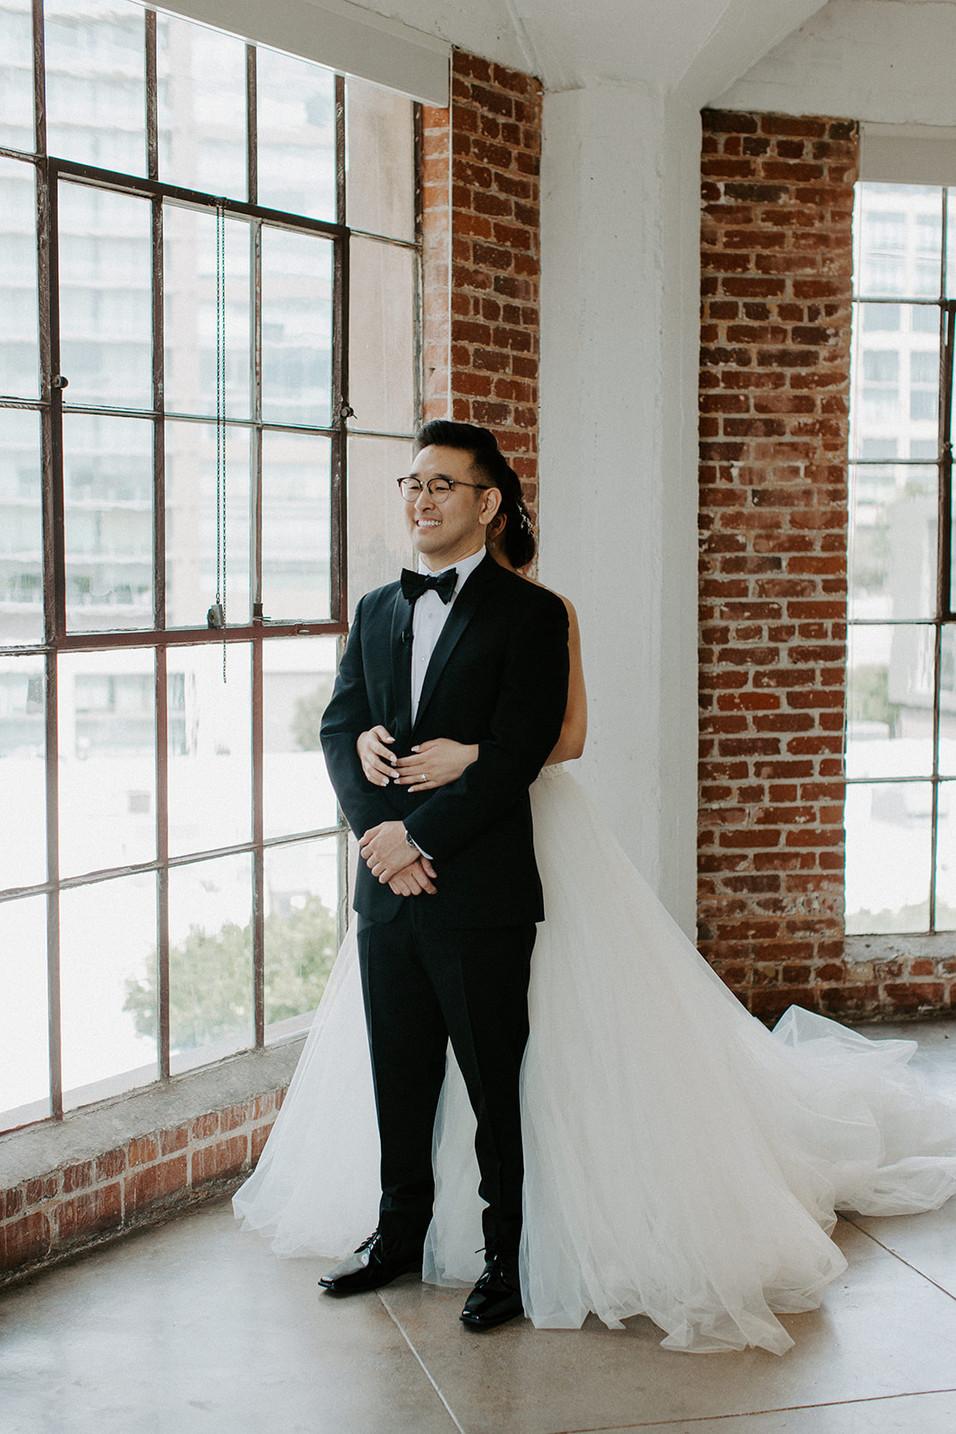 charmaine_ben_wedding_0209_websize.jpg